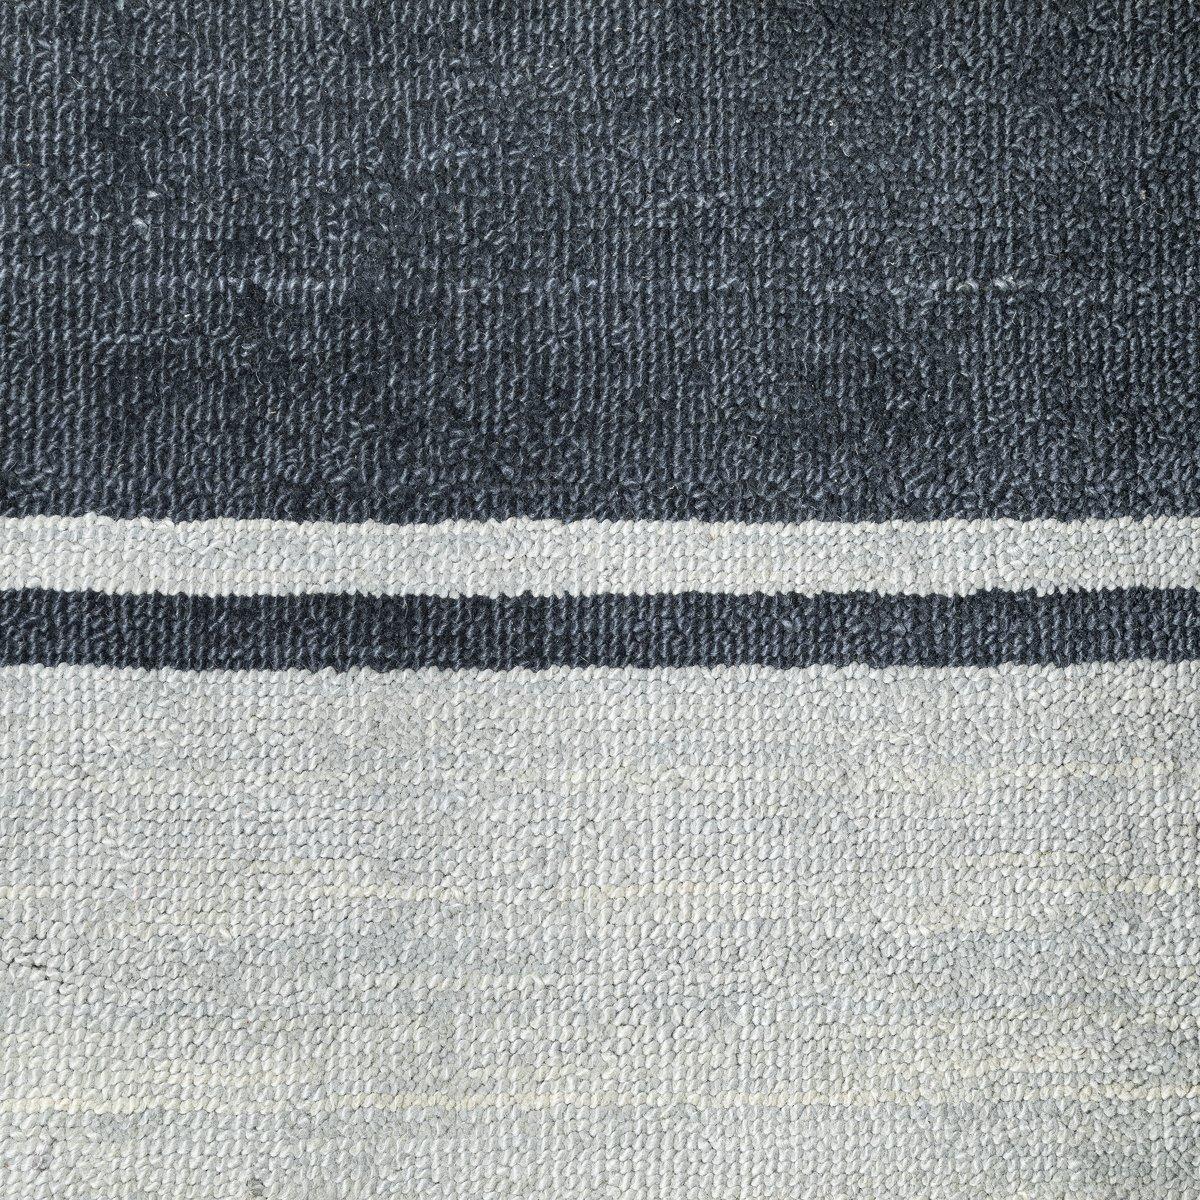 Tundra Dark Blue Wool 8x11 Area Rug